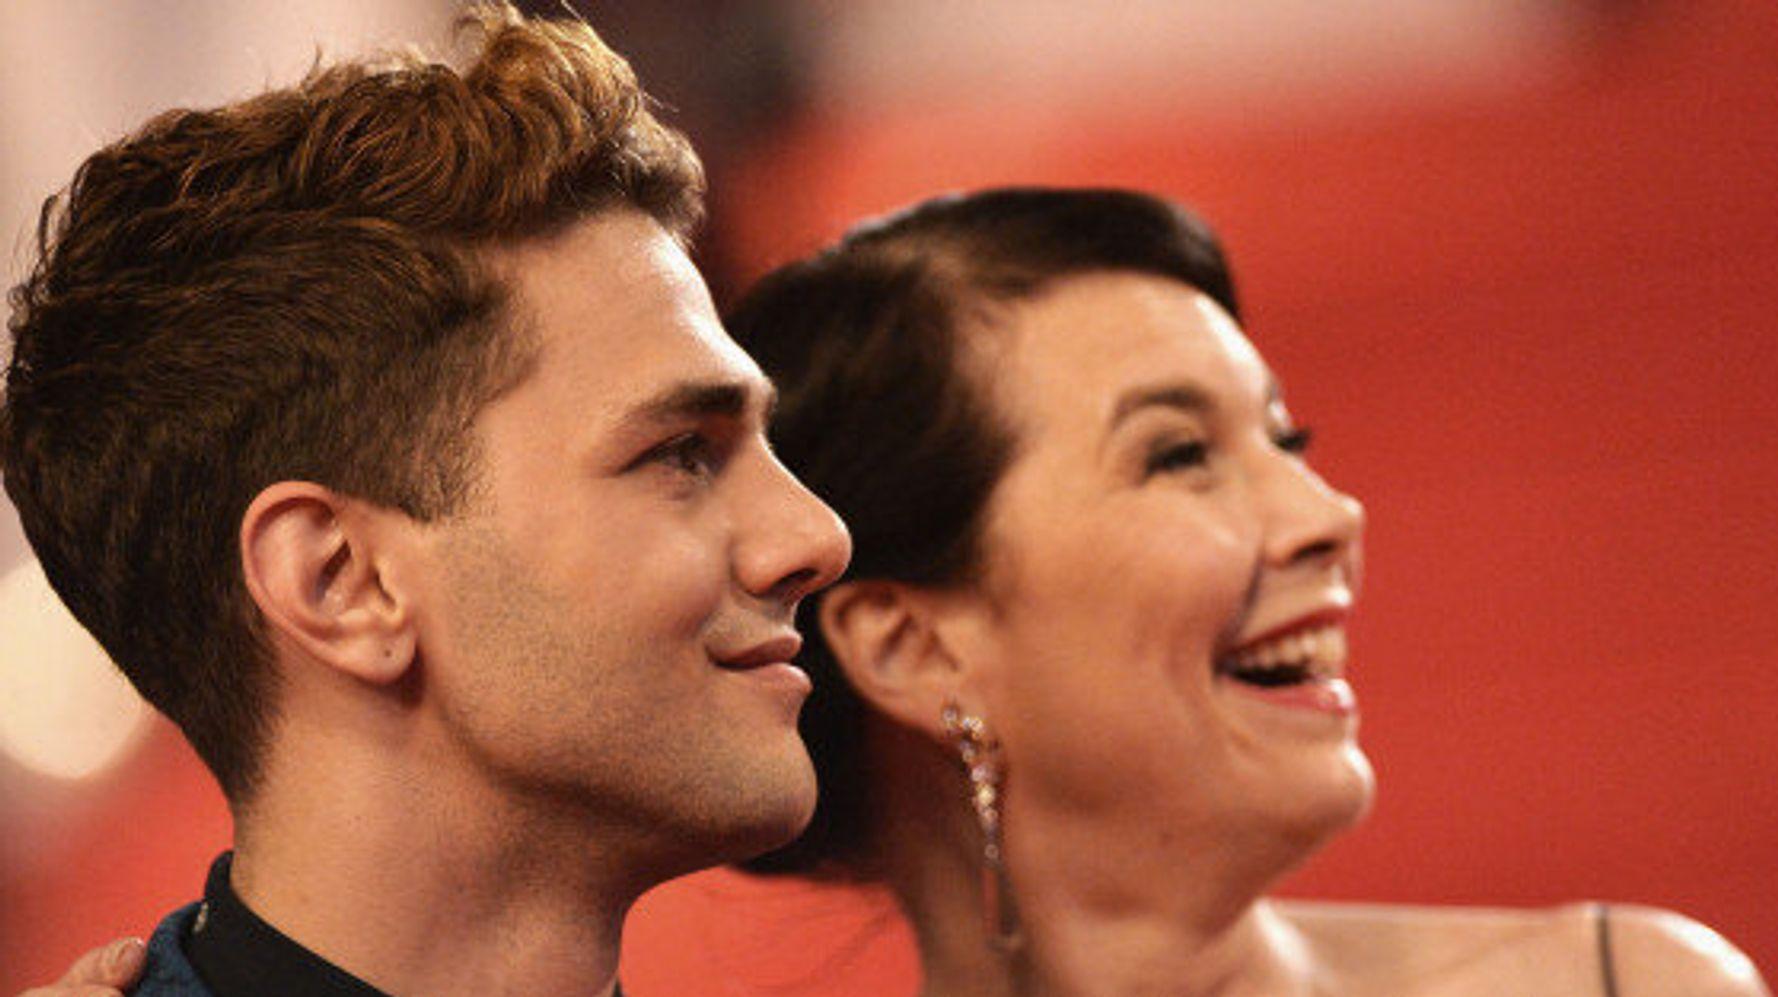 Xavier Dolans Mommy leads Vancouver Film Critics Circle